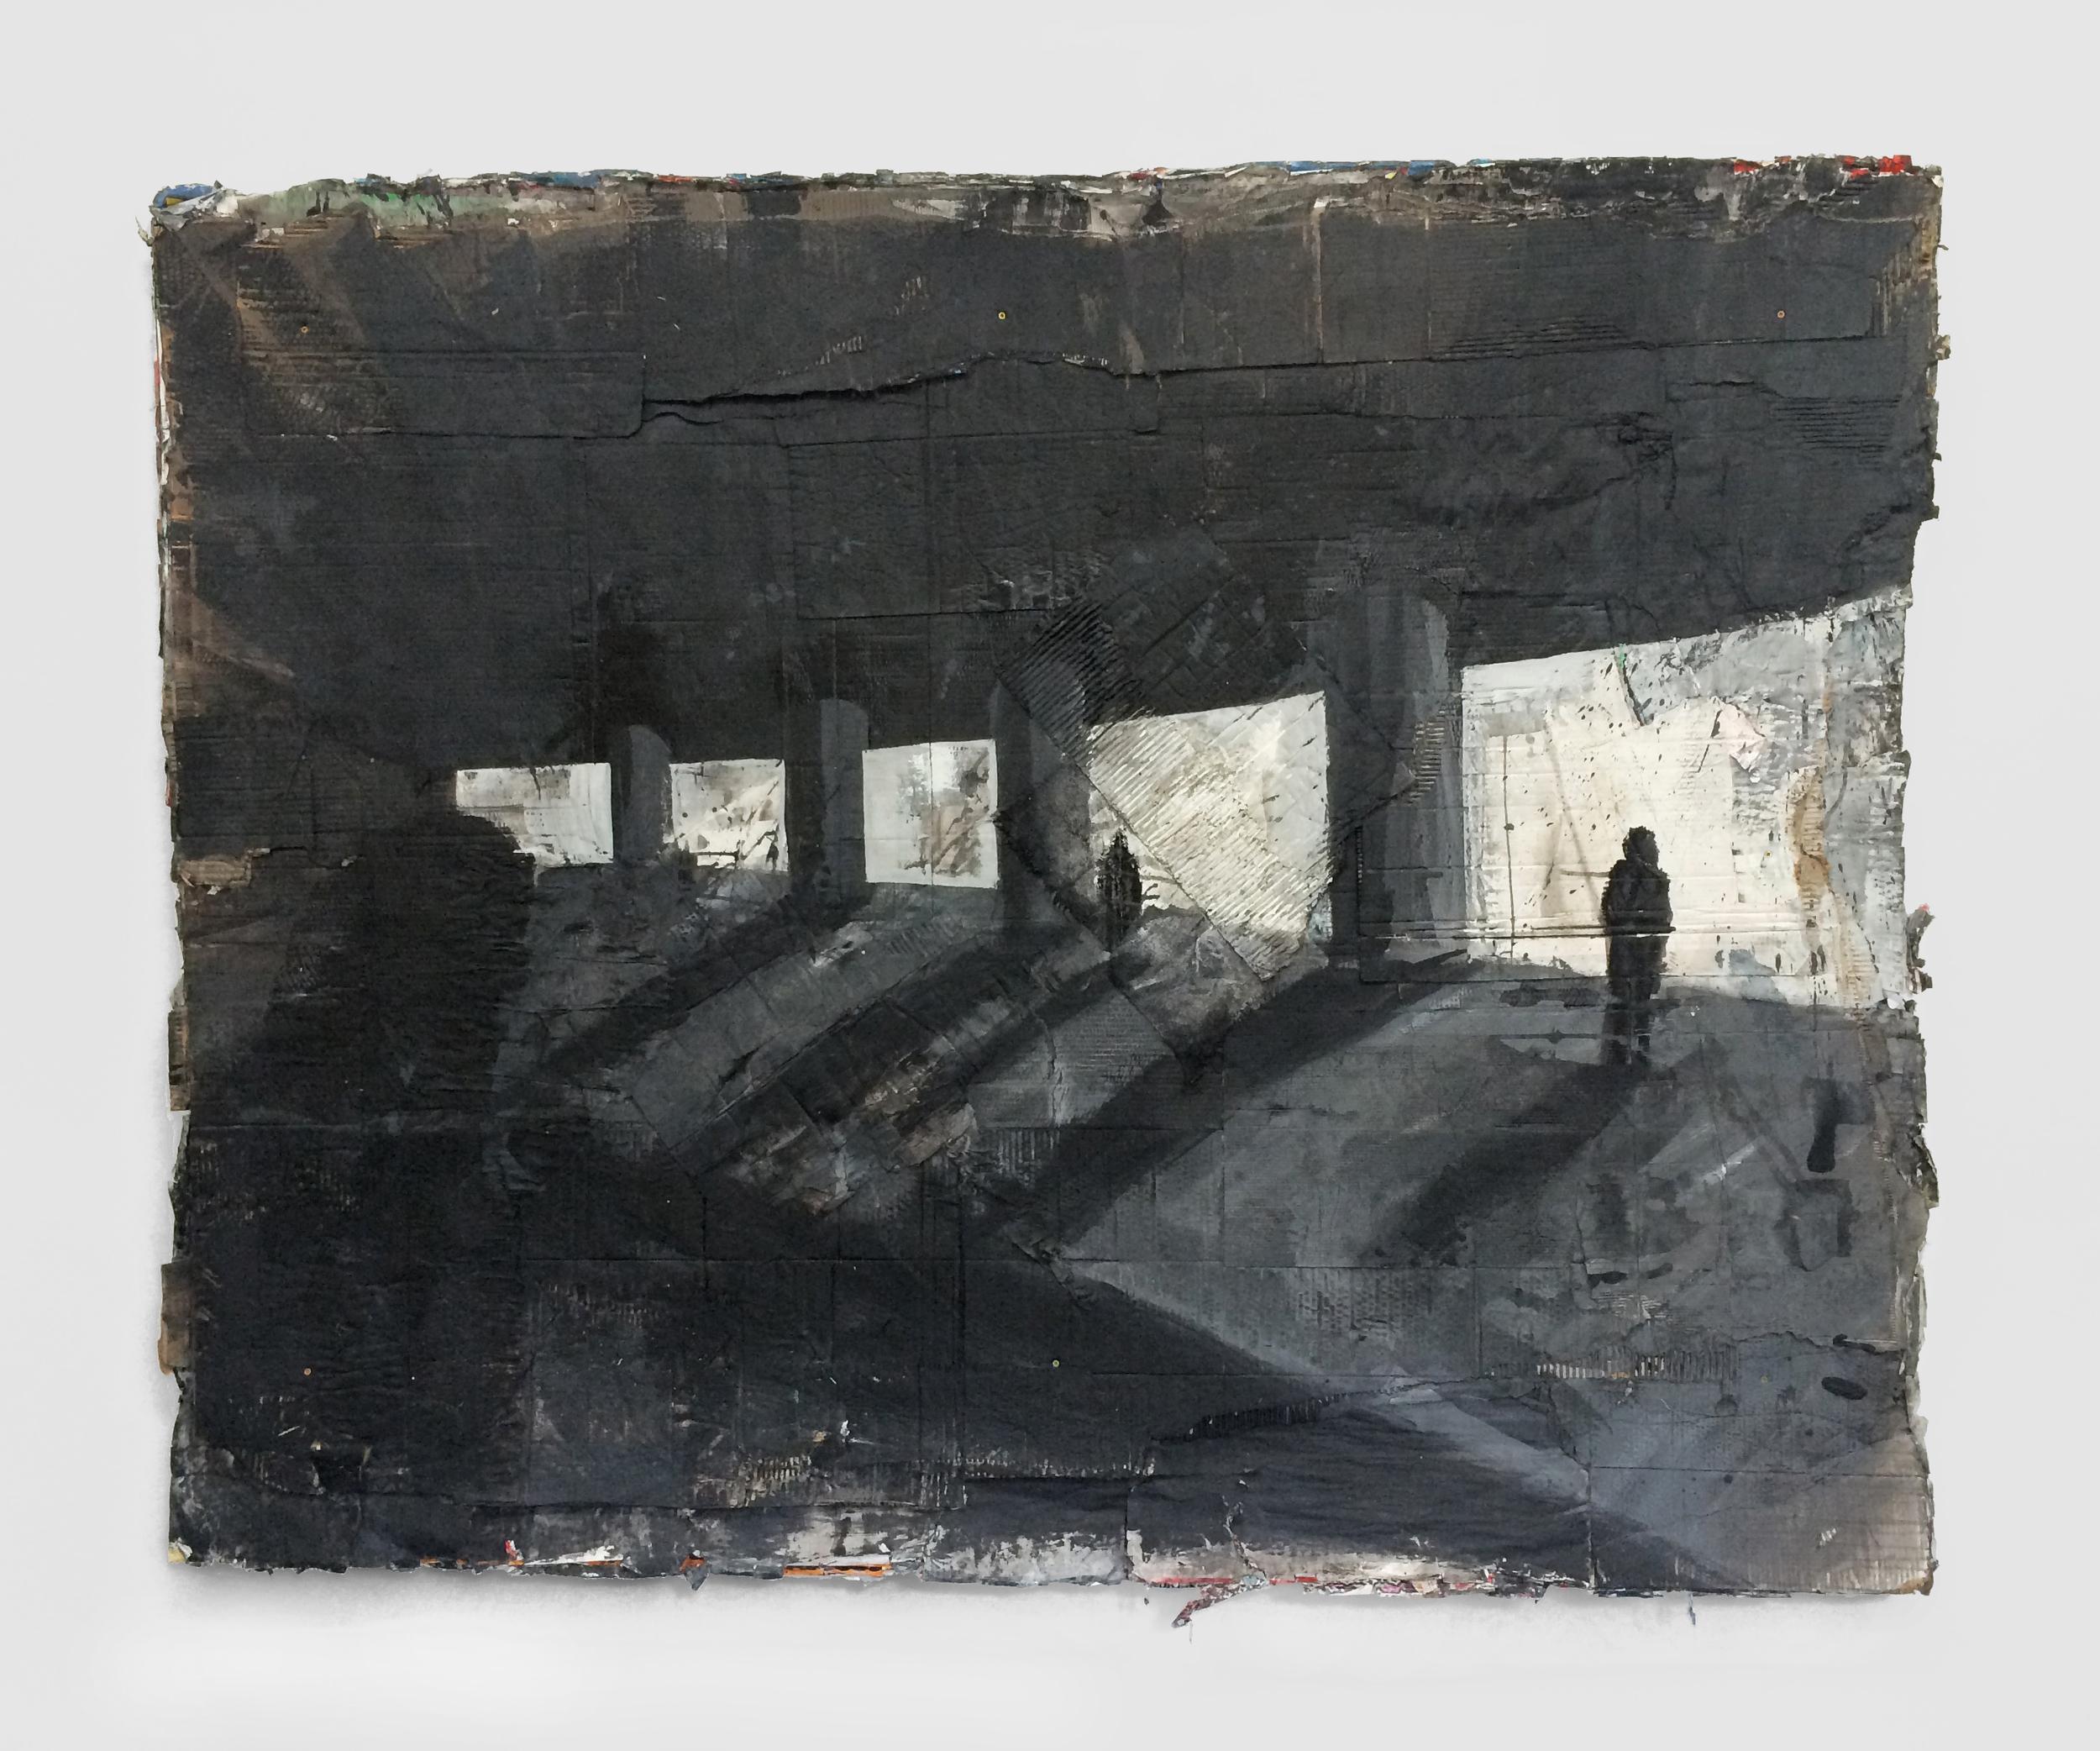 Aldo van den Broek_2014_Varketili_170 x 210 cm.jpg